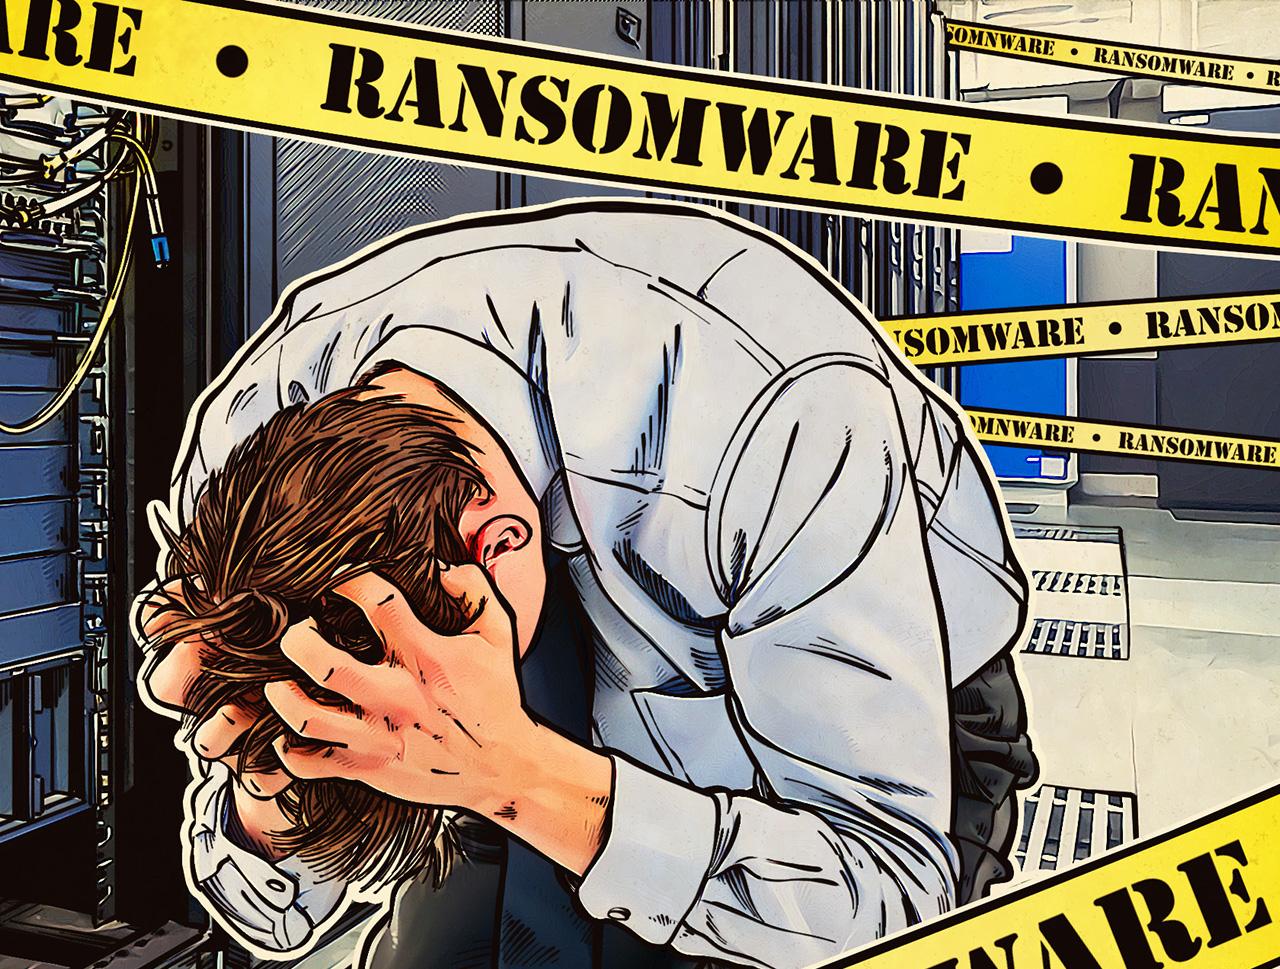 Kaspersky e INTERPOL insieme contro i ransomware